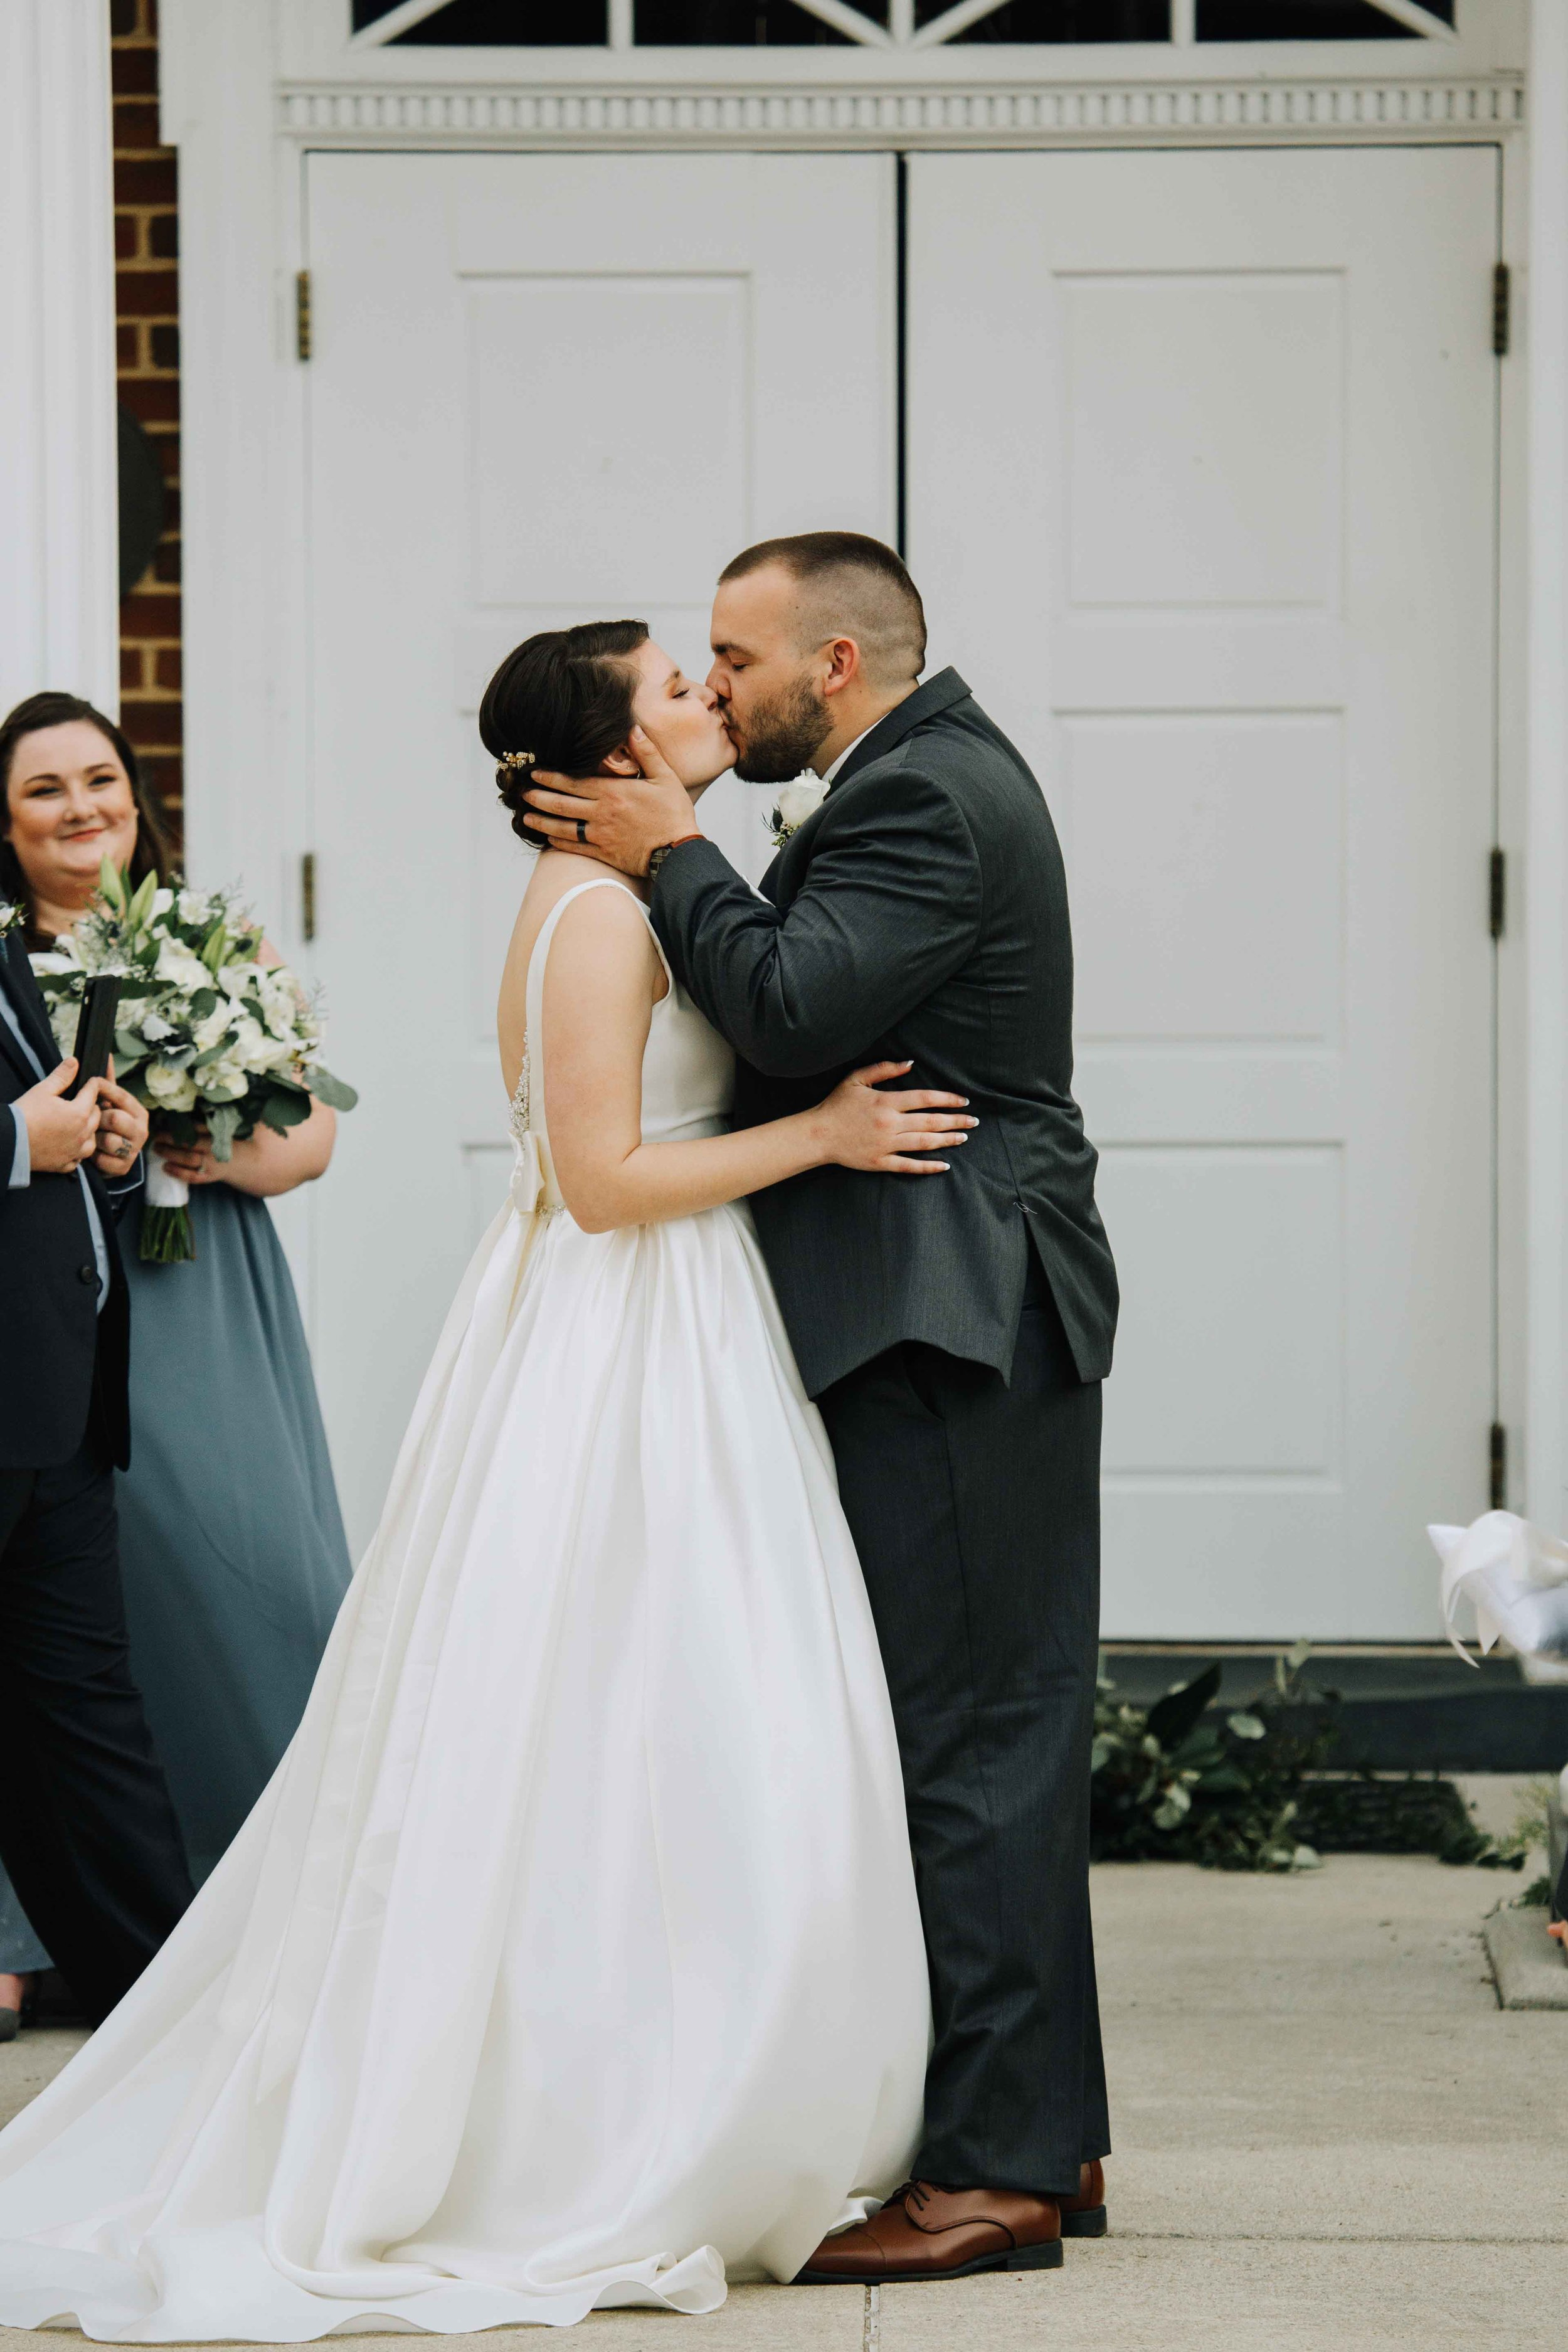 Farmville-Virginia-Wedding-Hotel-Weynoke-Downtown-Jacqueline-Waters-Photography-Detailed- (843).jpg